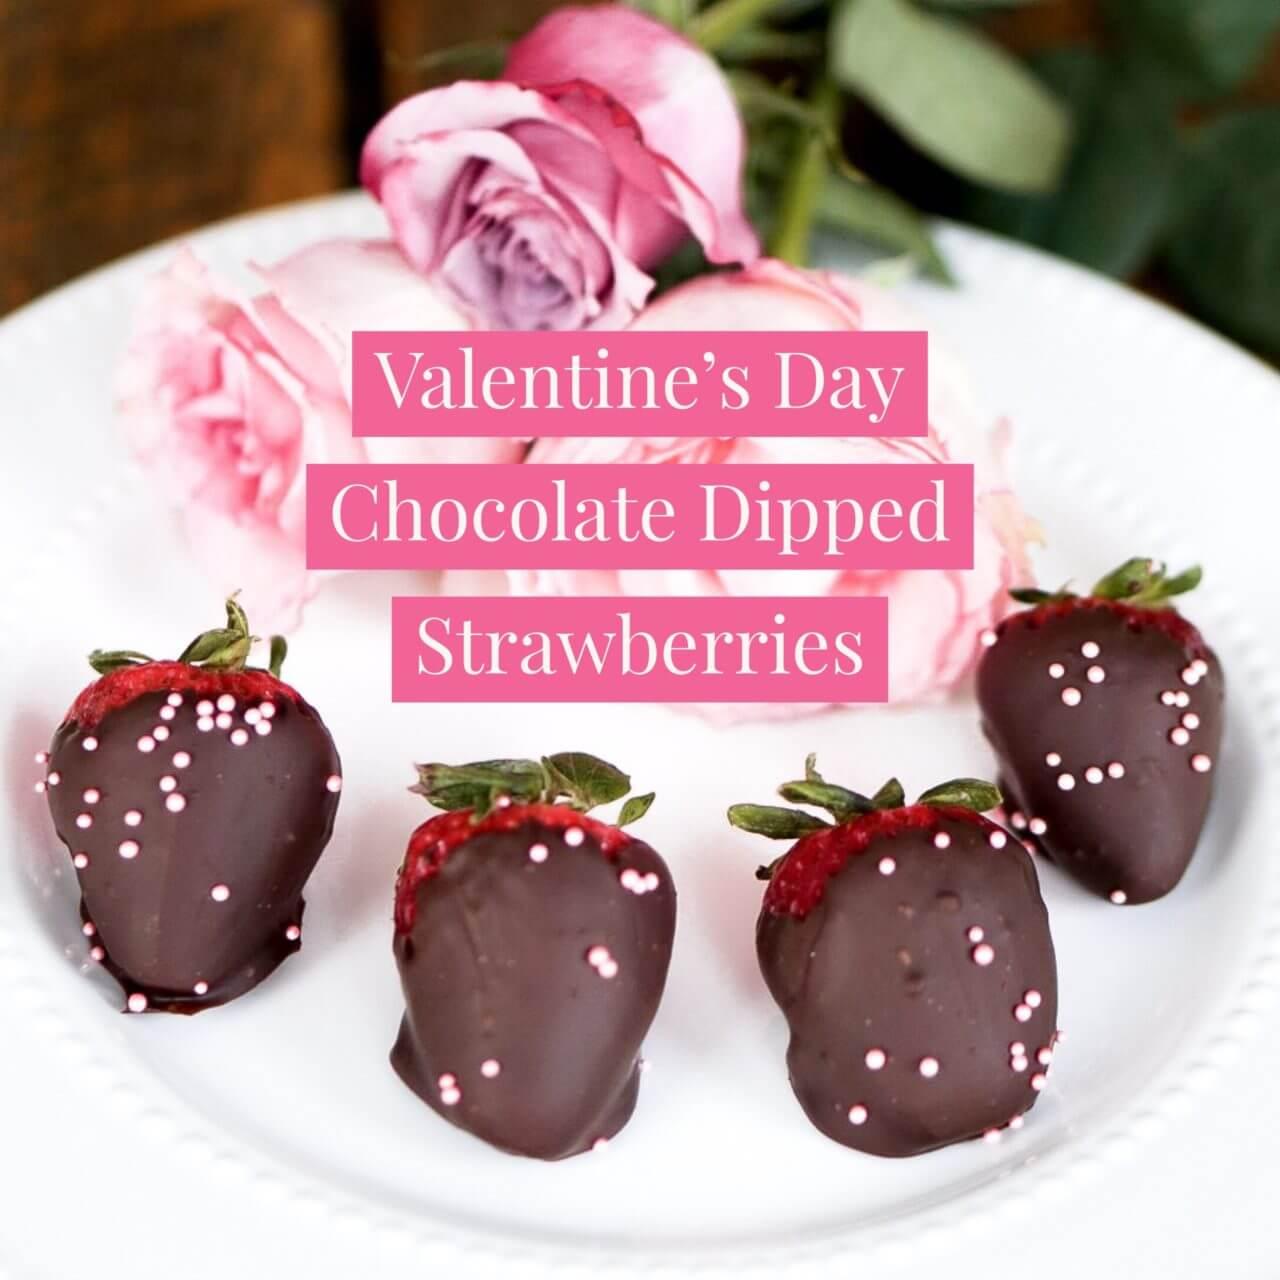 Valentine's Day Chocolate Dipped Strawberries